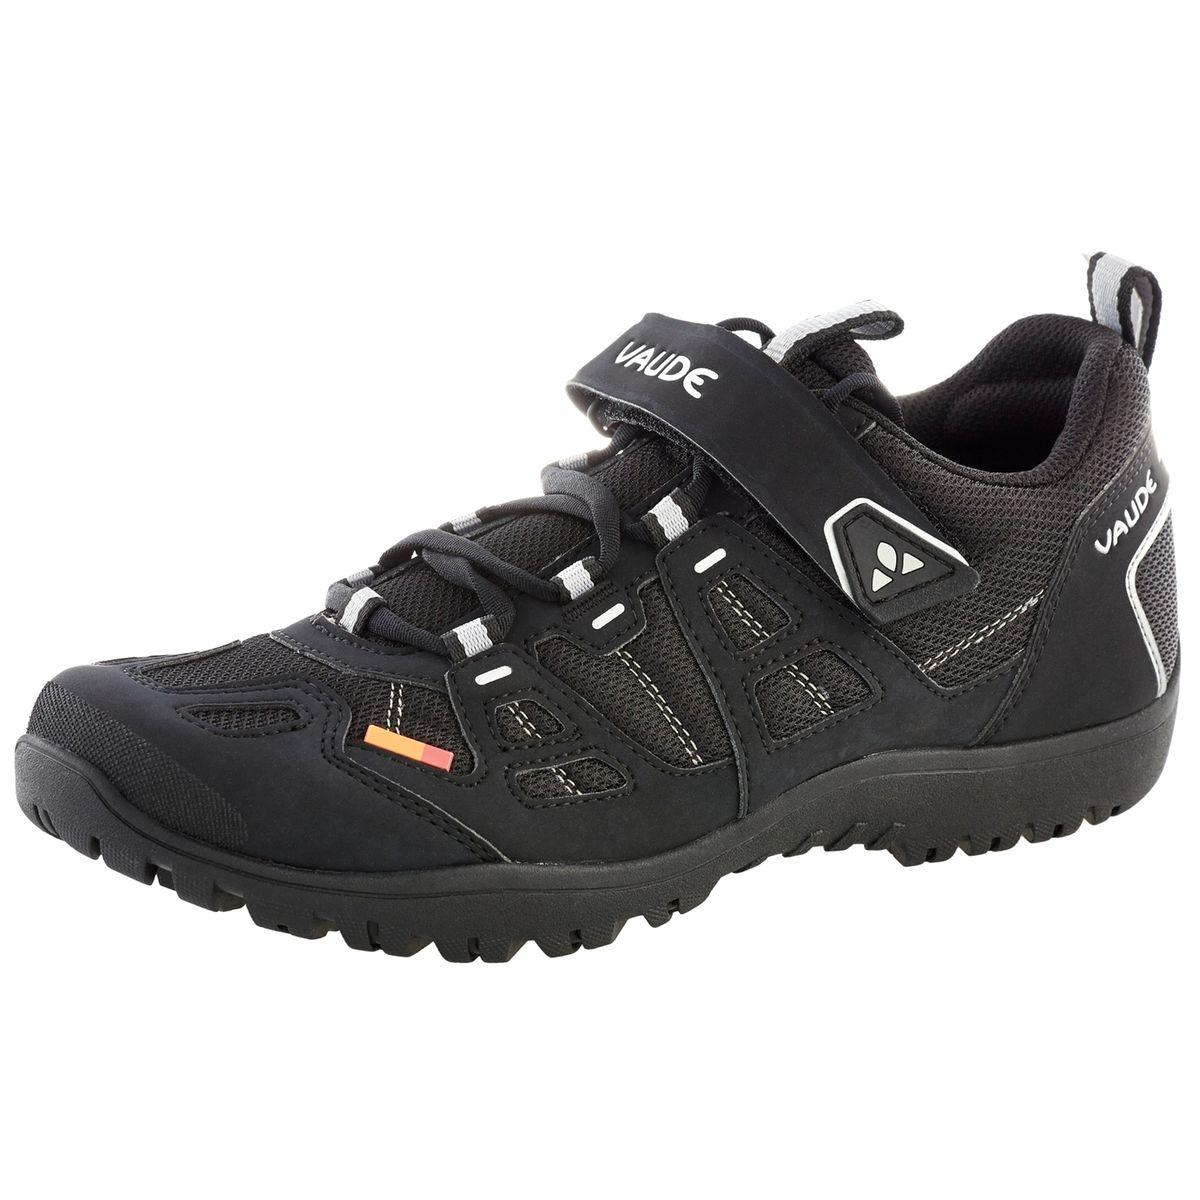 Kelby TR - Chaussures trekking homme - noir